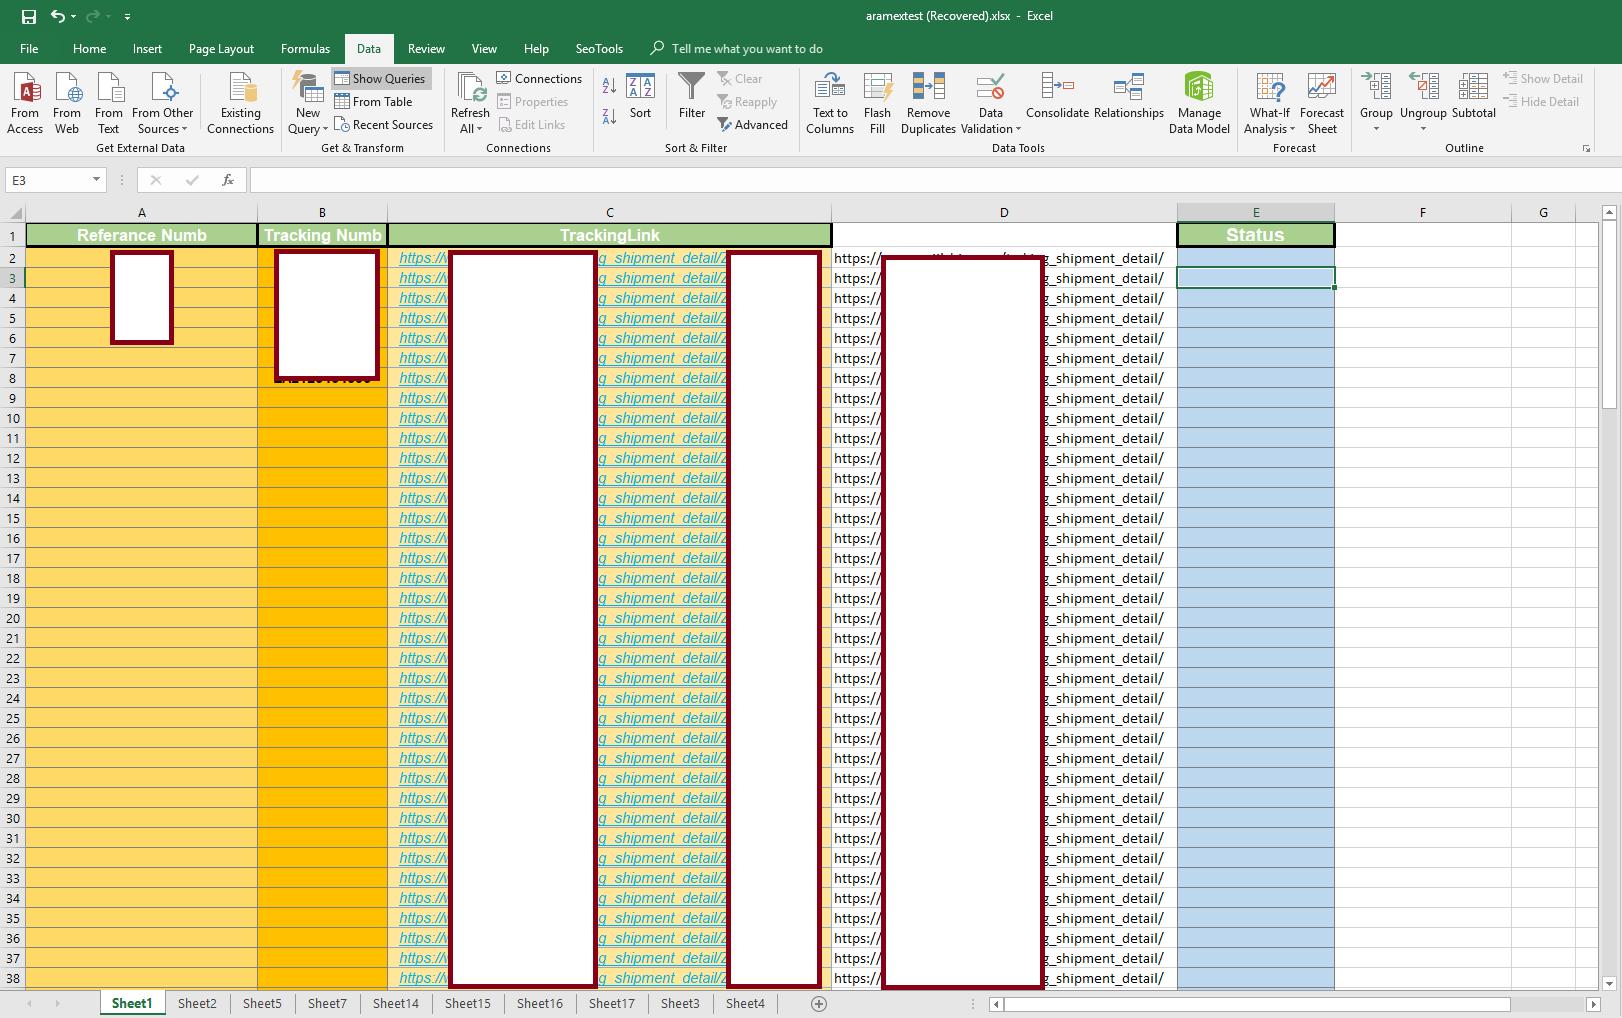 Excel - Power Query - Advanced Editor Help - Microsoft Community